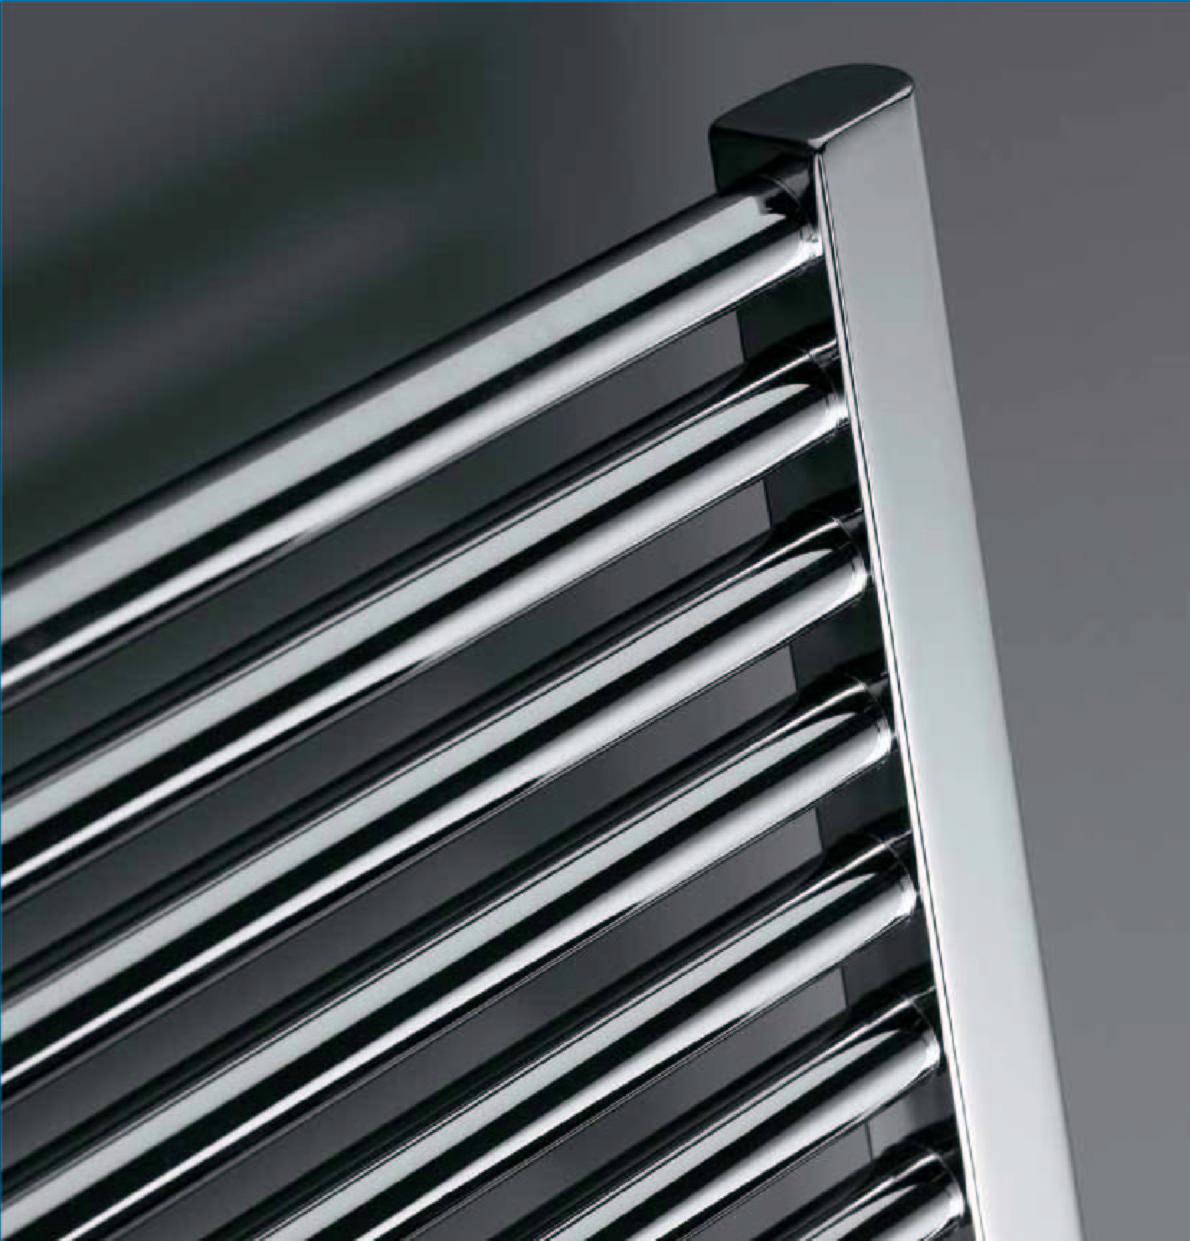 Электрический полотенцесушитель Brandoni WT 050/075 хром